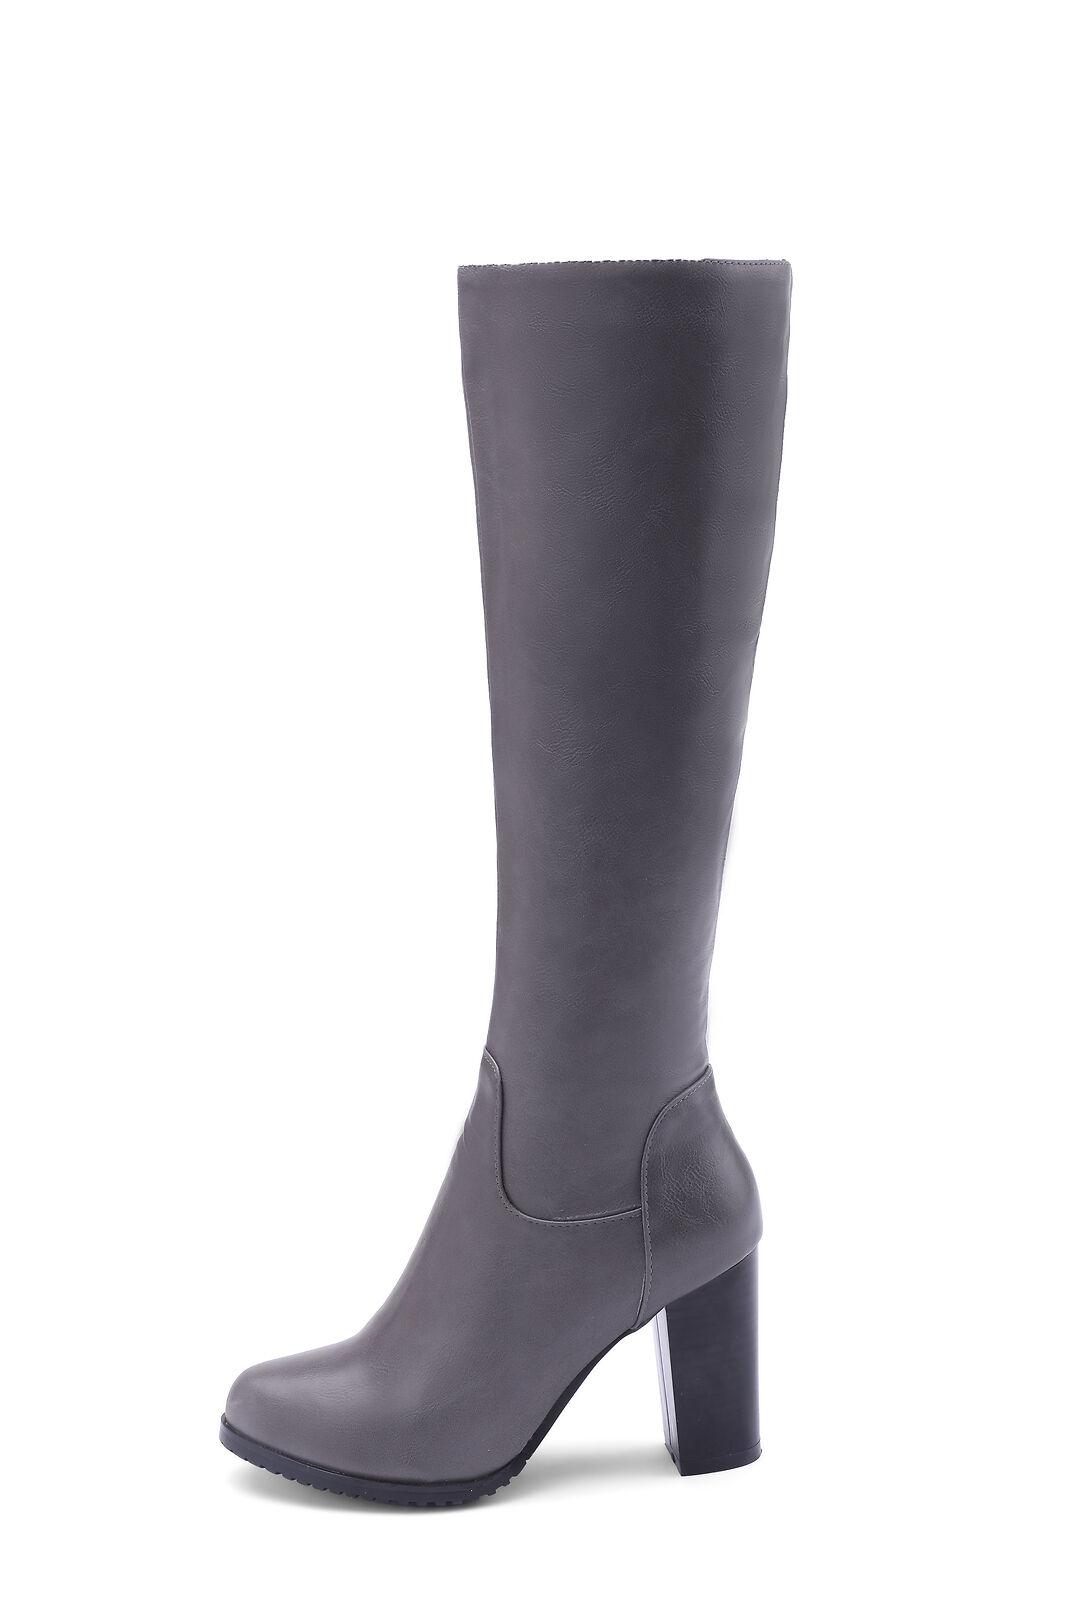 Elegant Kneehohe Stiefel Stiefel Damen Langschaft Stiefel Kneehohe Hoher Absatz Reißverschluss Mode 12e029